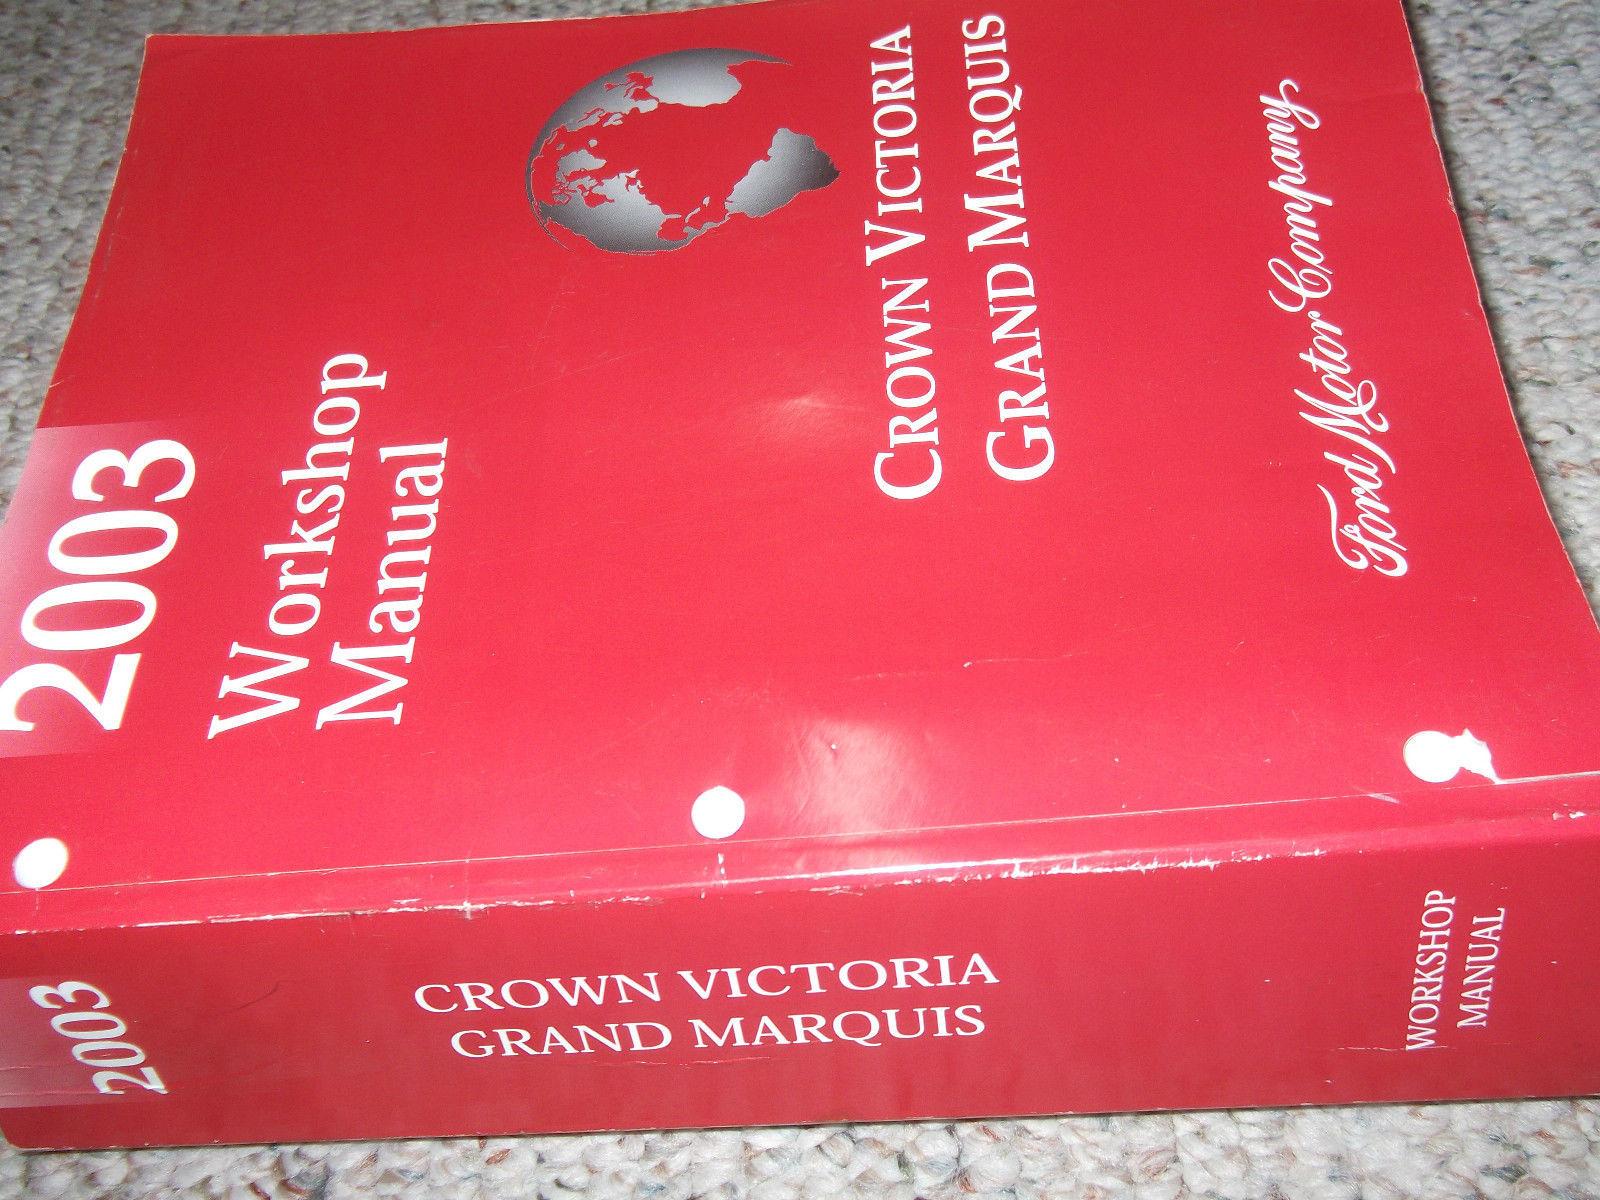 2003 FORD CROWN VICTORIA MERCURY GRAND MARQUIS Service Shop Repair Manual NEW